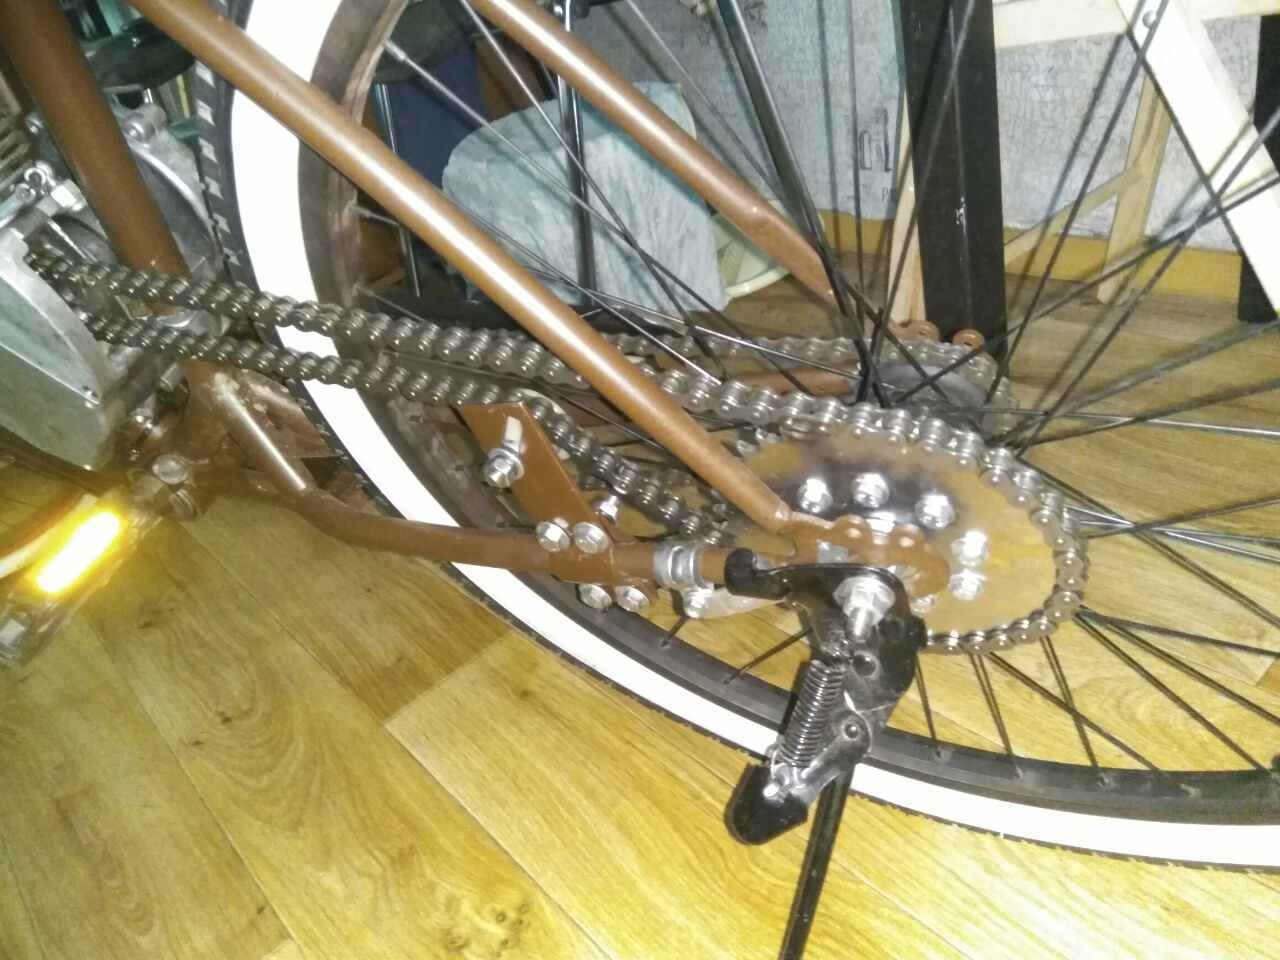 Ремонт велосипеда своими руками от а до я фото 725